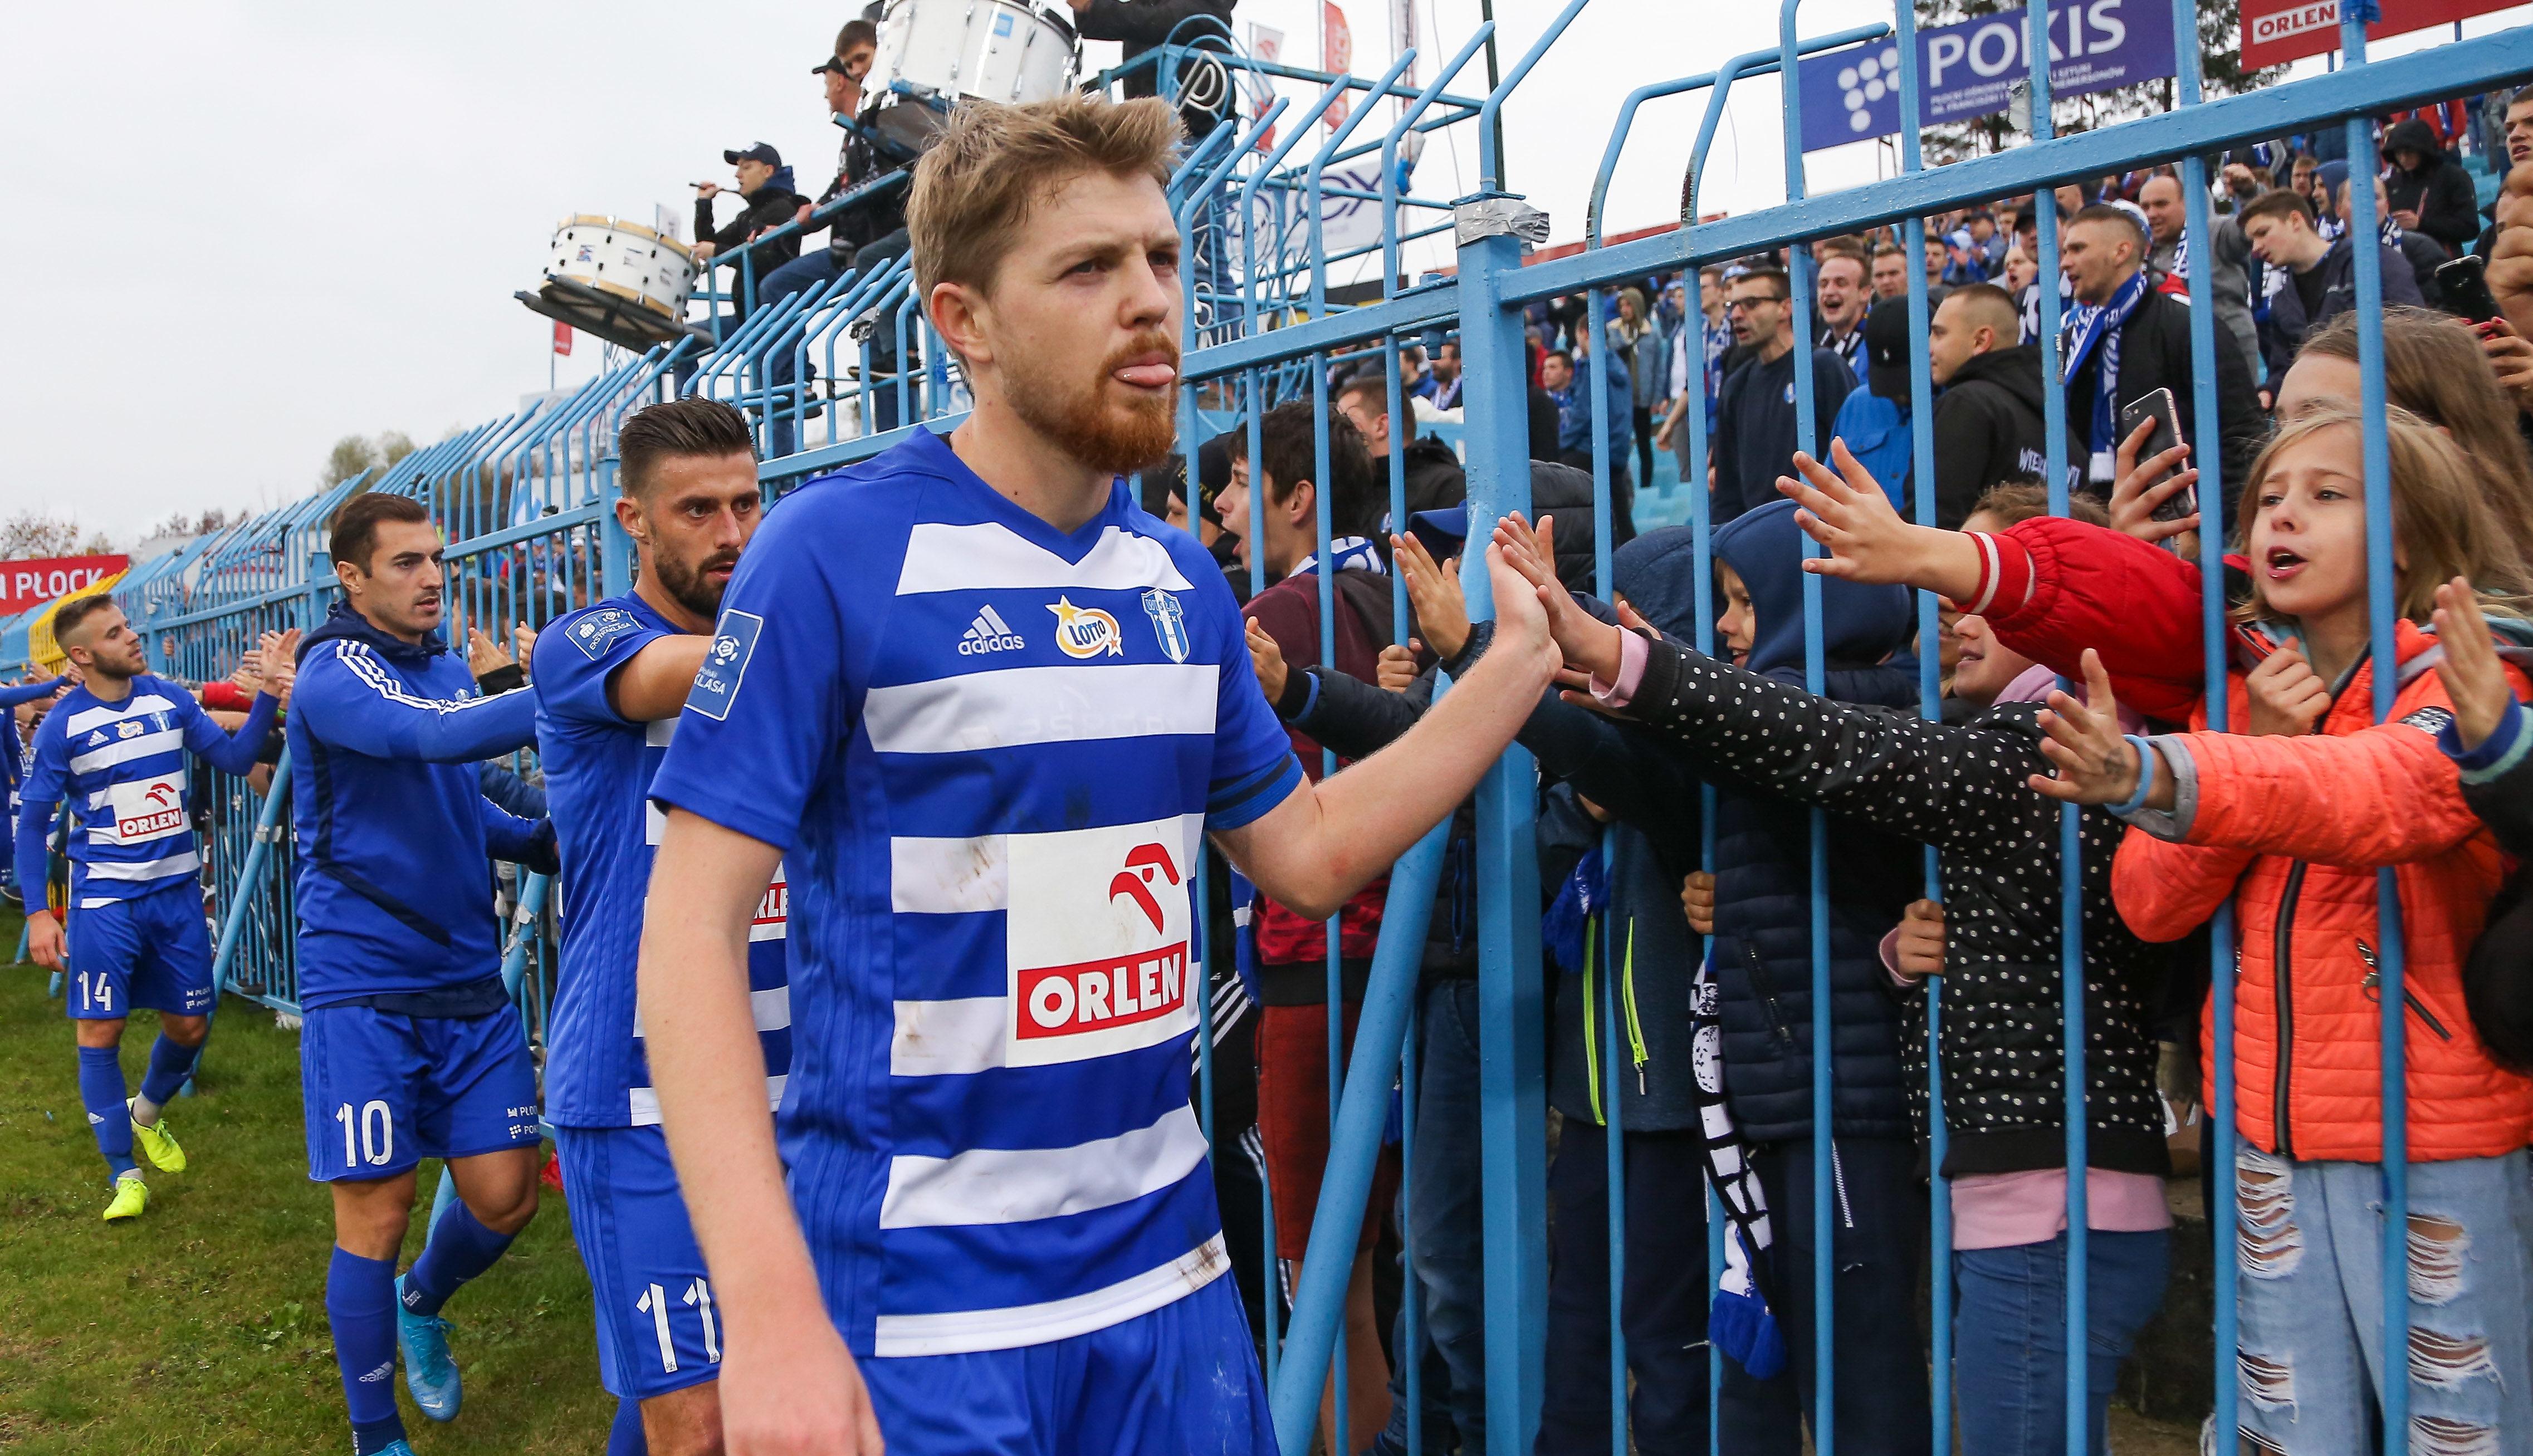 Dominik Furman